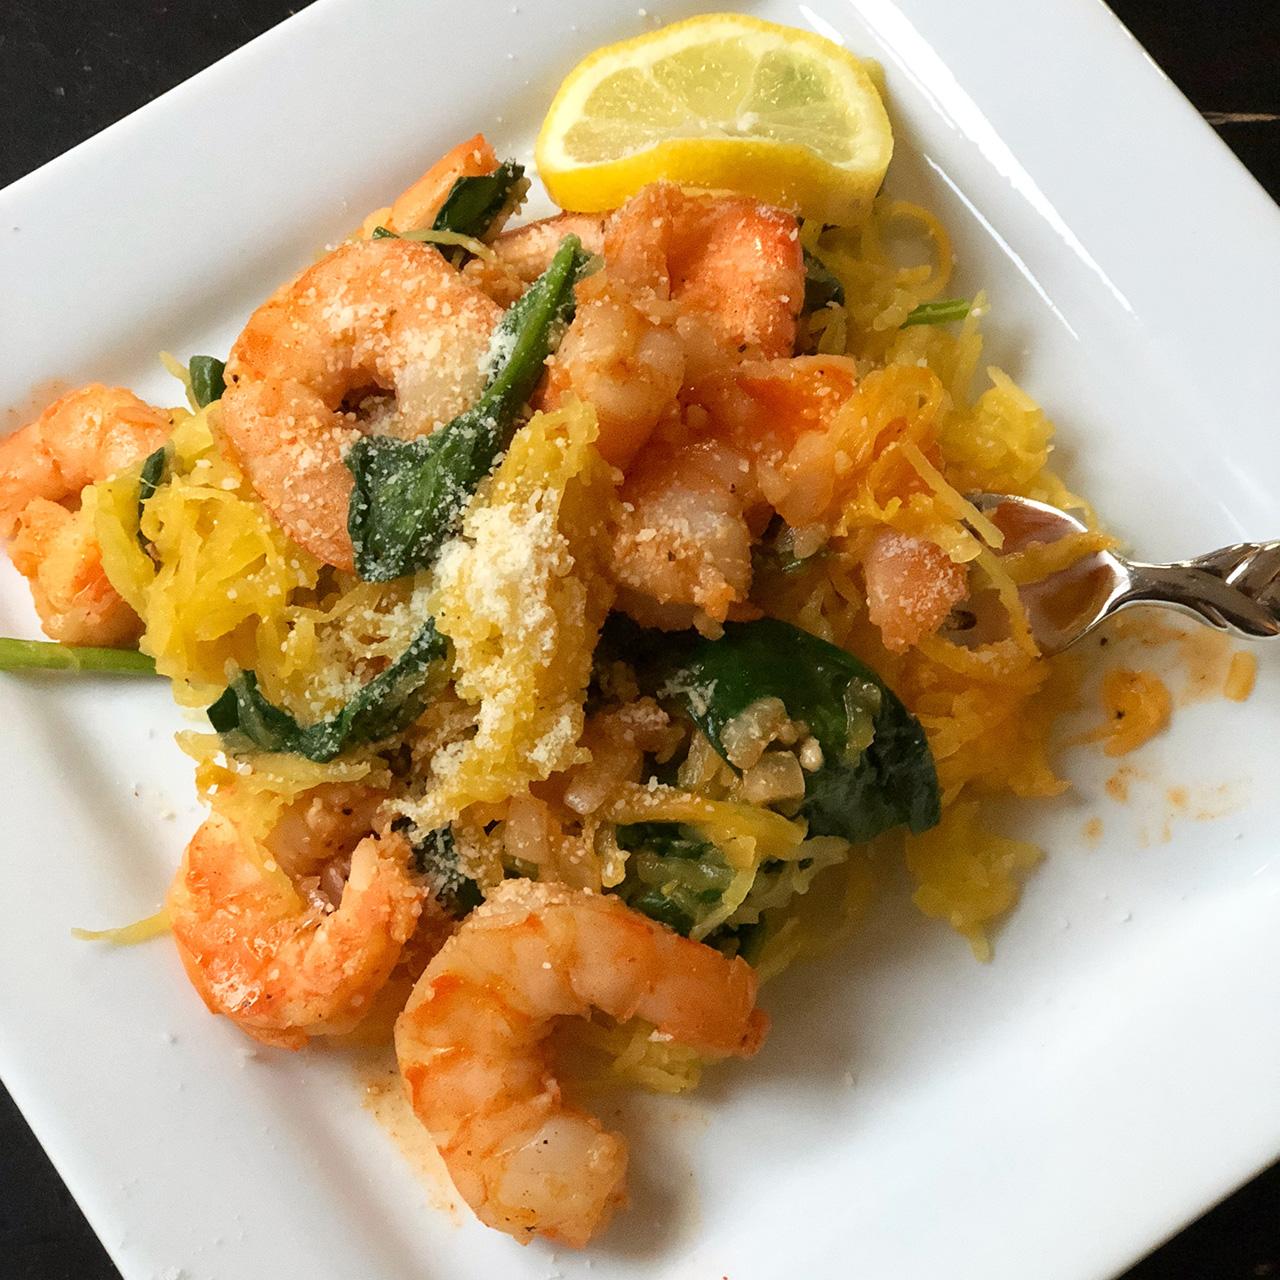 Shrimp Scampi with Spaghetti Squash